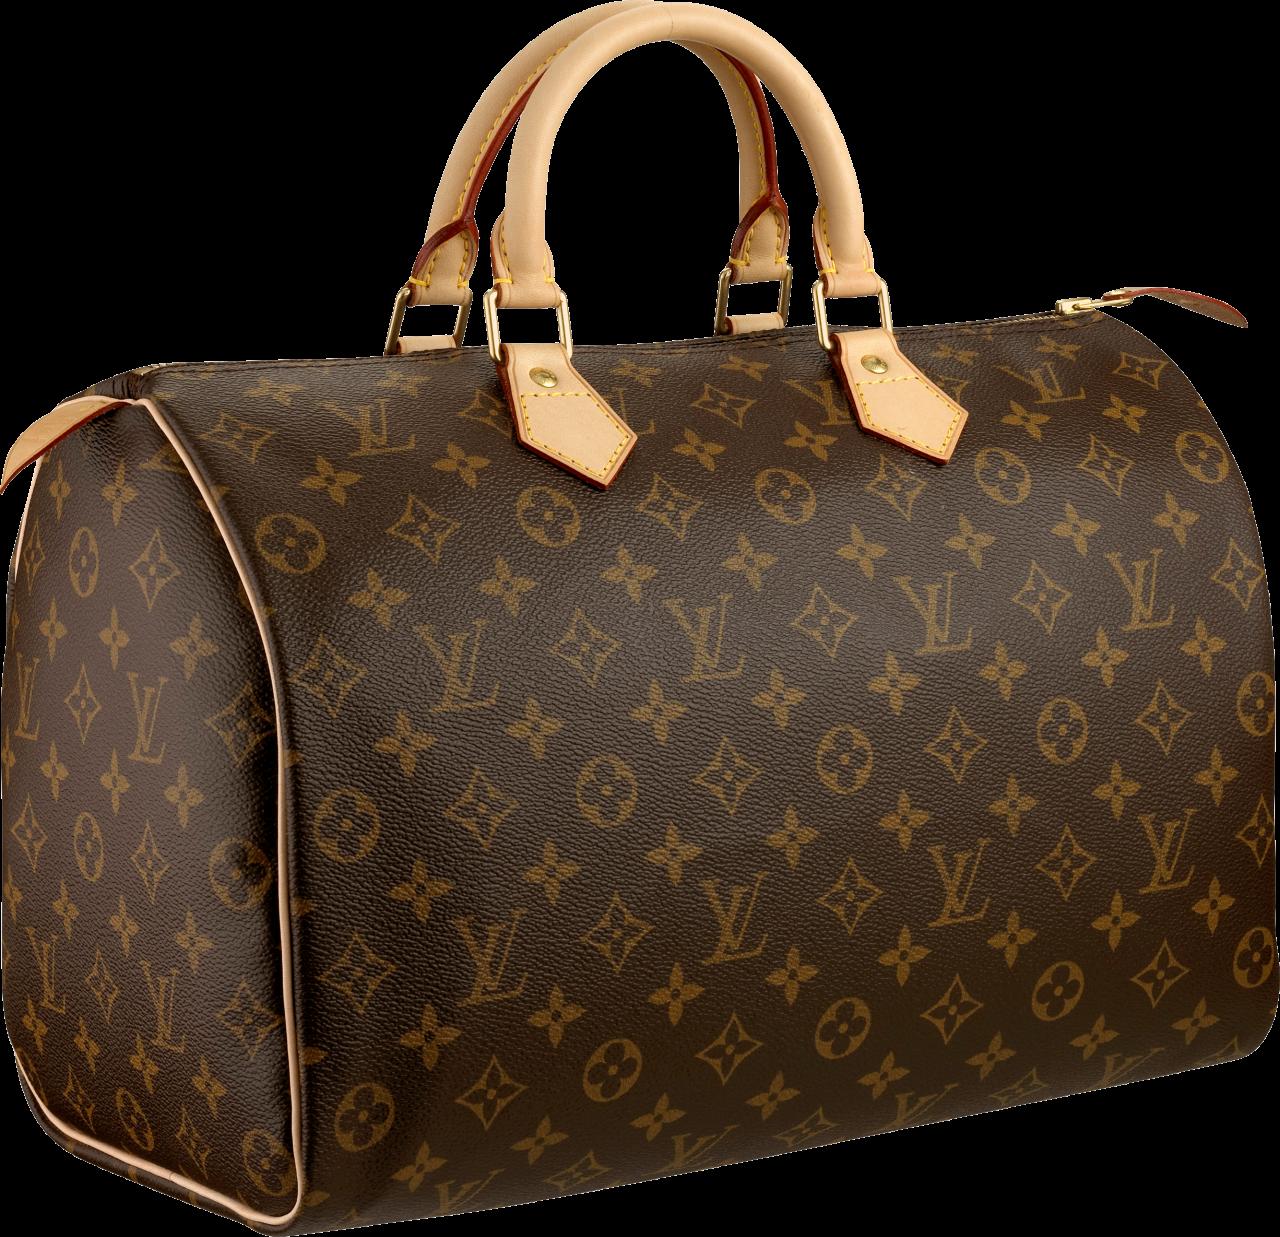 Louis Vuitton Women bag PNG Image